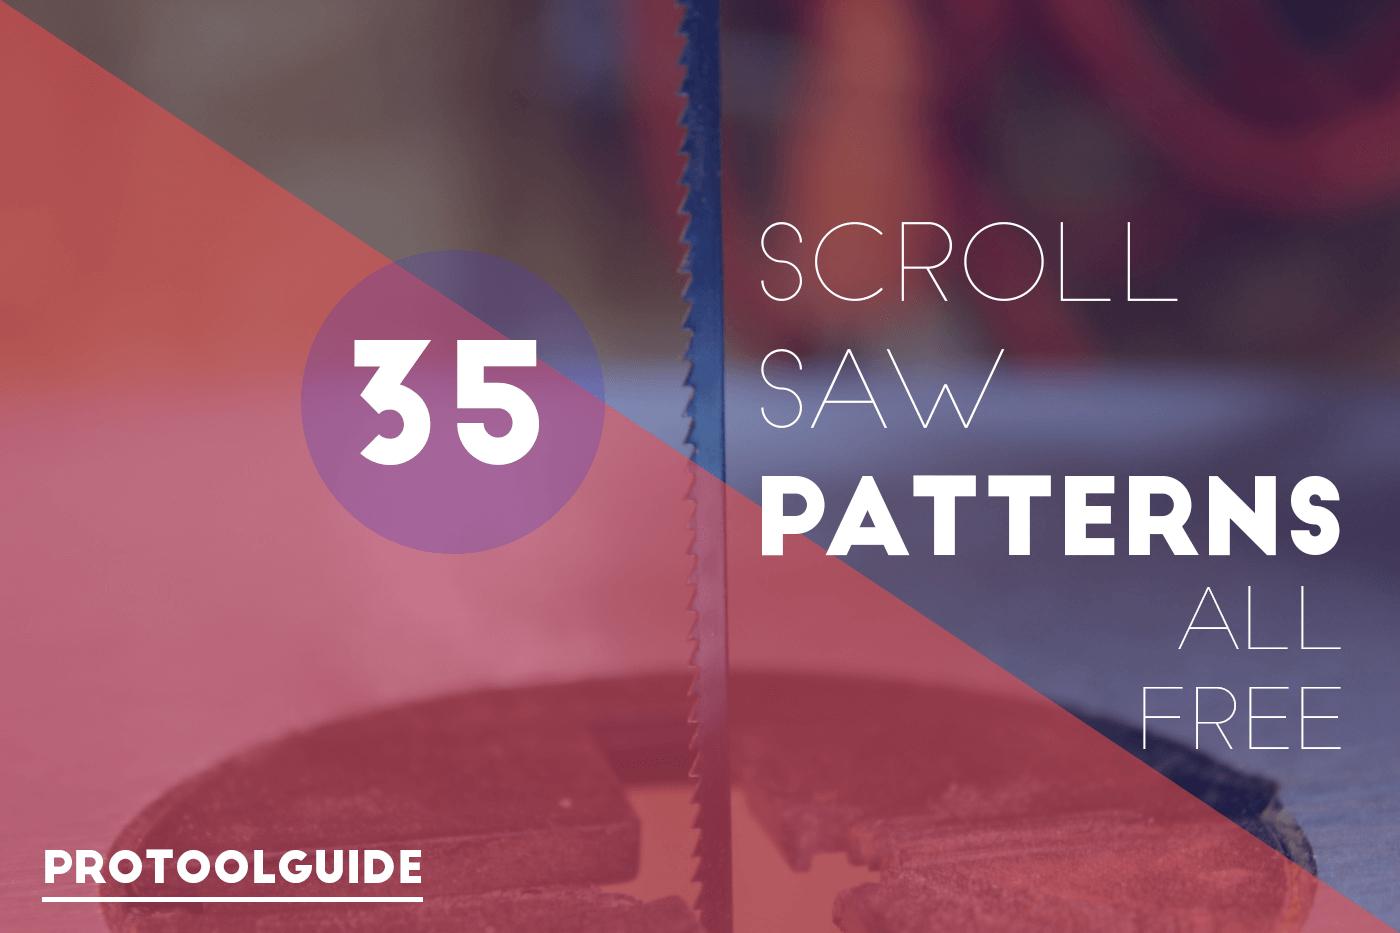 35 Free Scroll Saw Patterns To Make Pretty Wood Crafts - Free Printable Scroll Saw Patterns